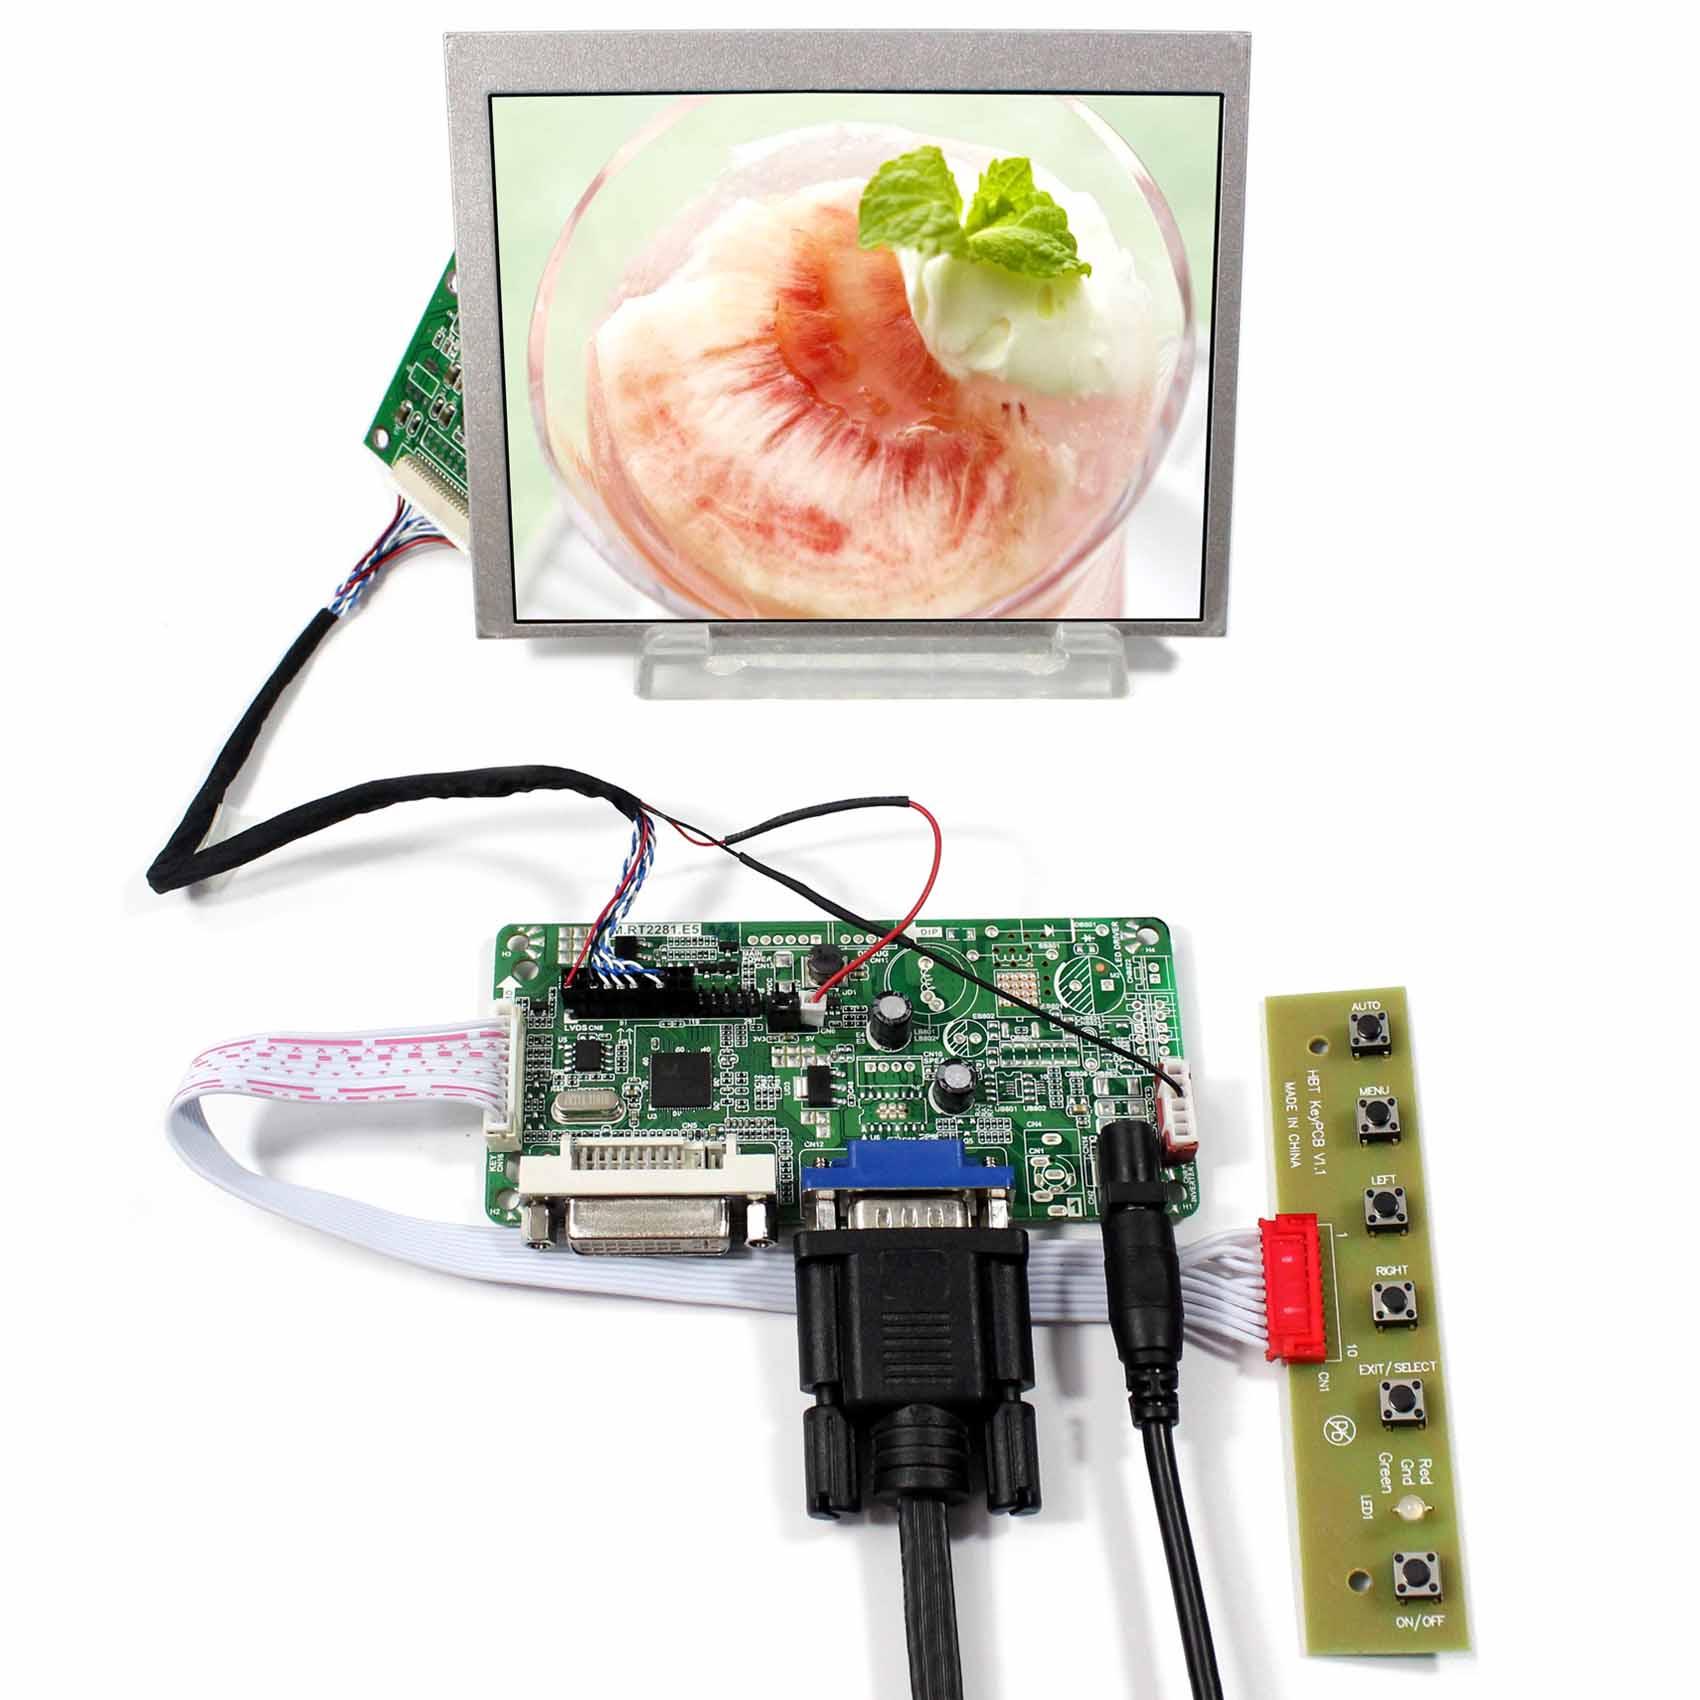 DVI+VGA+LCD Controller Board LVDS Tcon Board With 5.6inch 640X480 AT056TN53-V1 LCD Screen vm70a vga to lvds lcd controller board for mt215dw01 v2 21 5 inch 1920x1080 2ccfl lvds video board free shipping